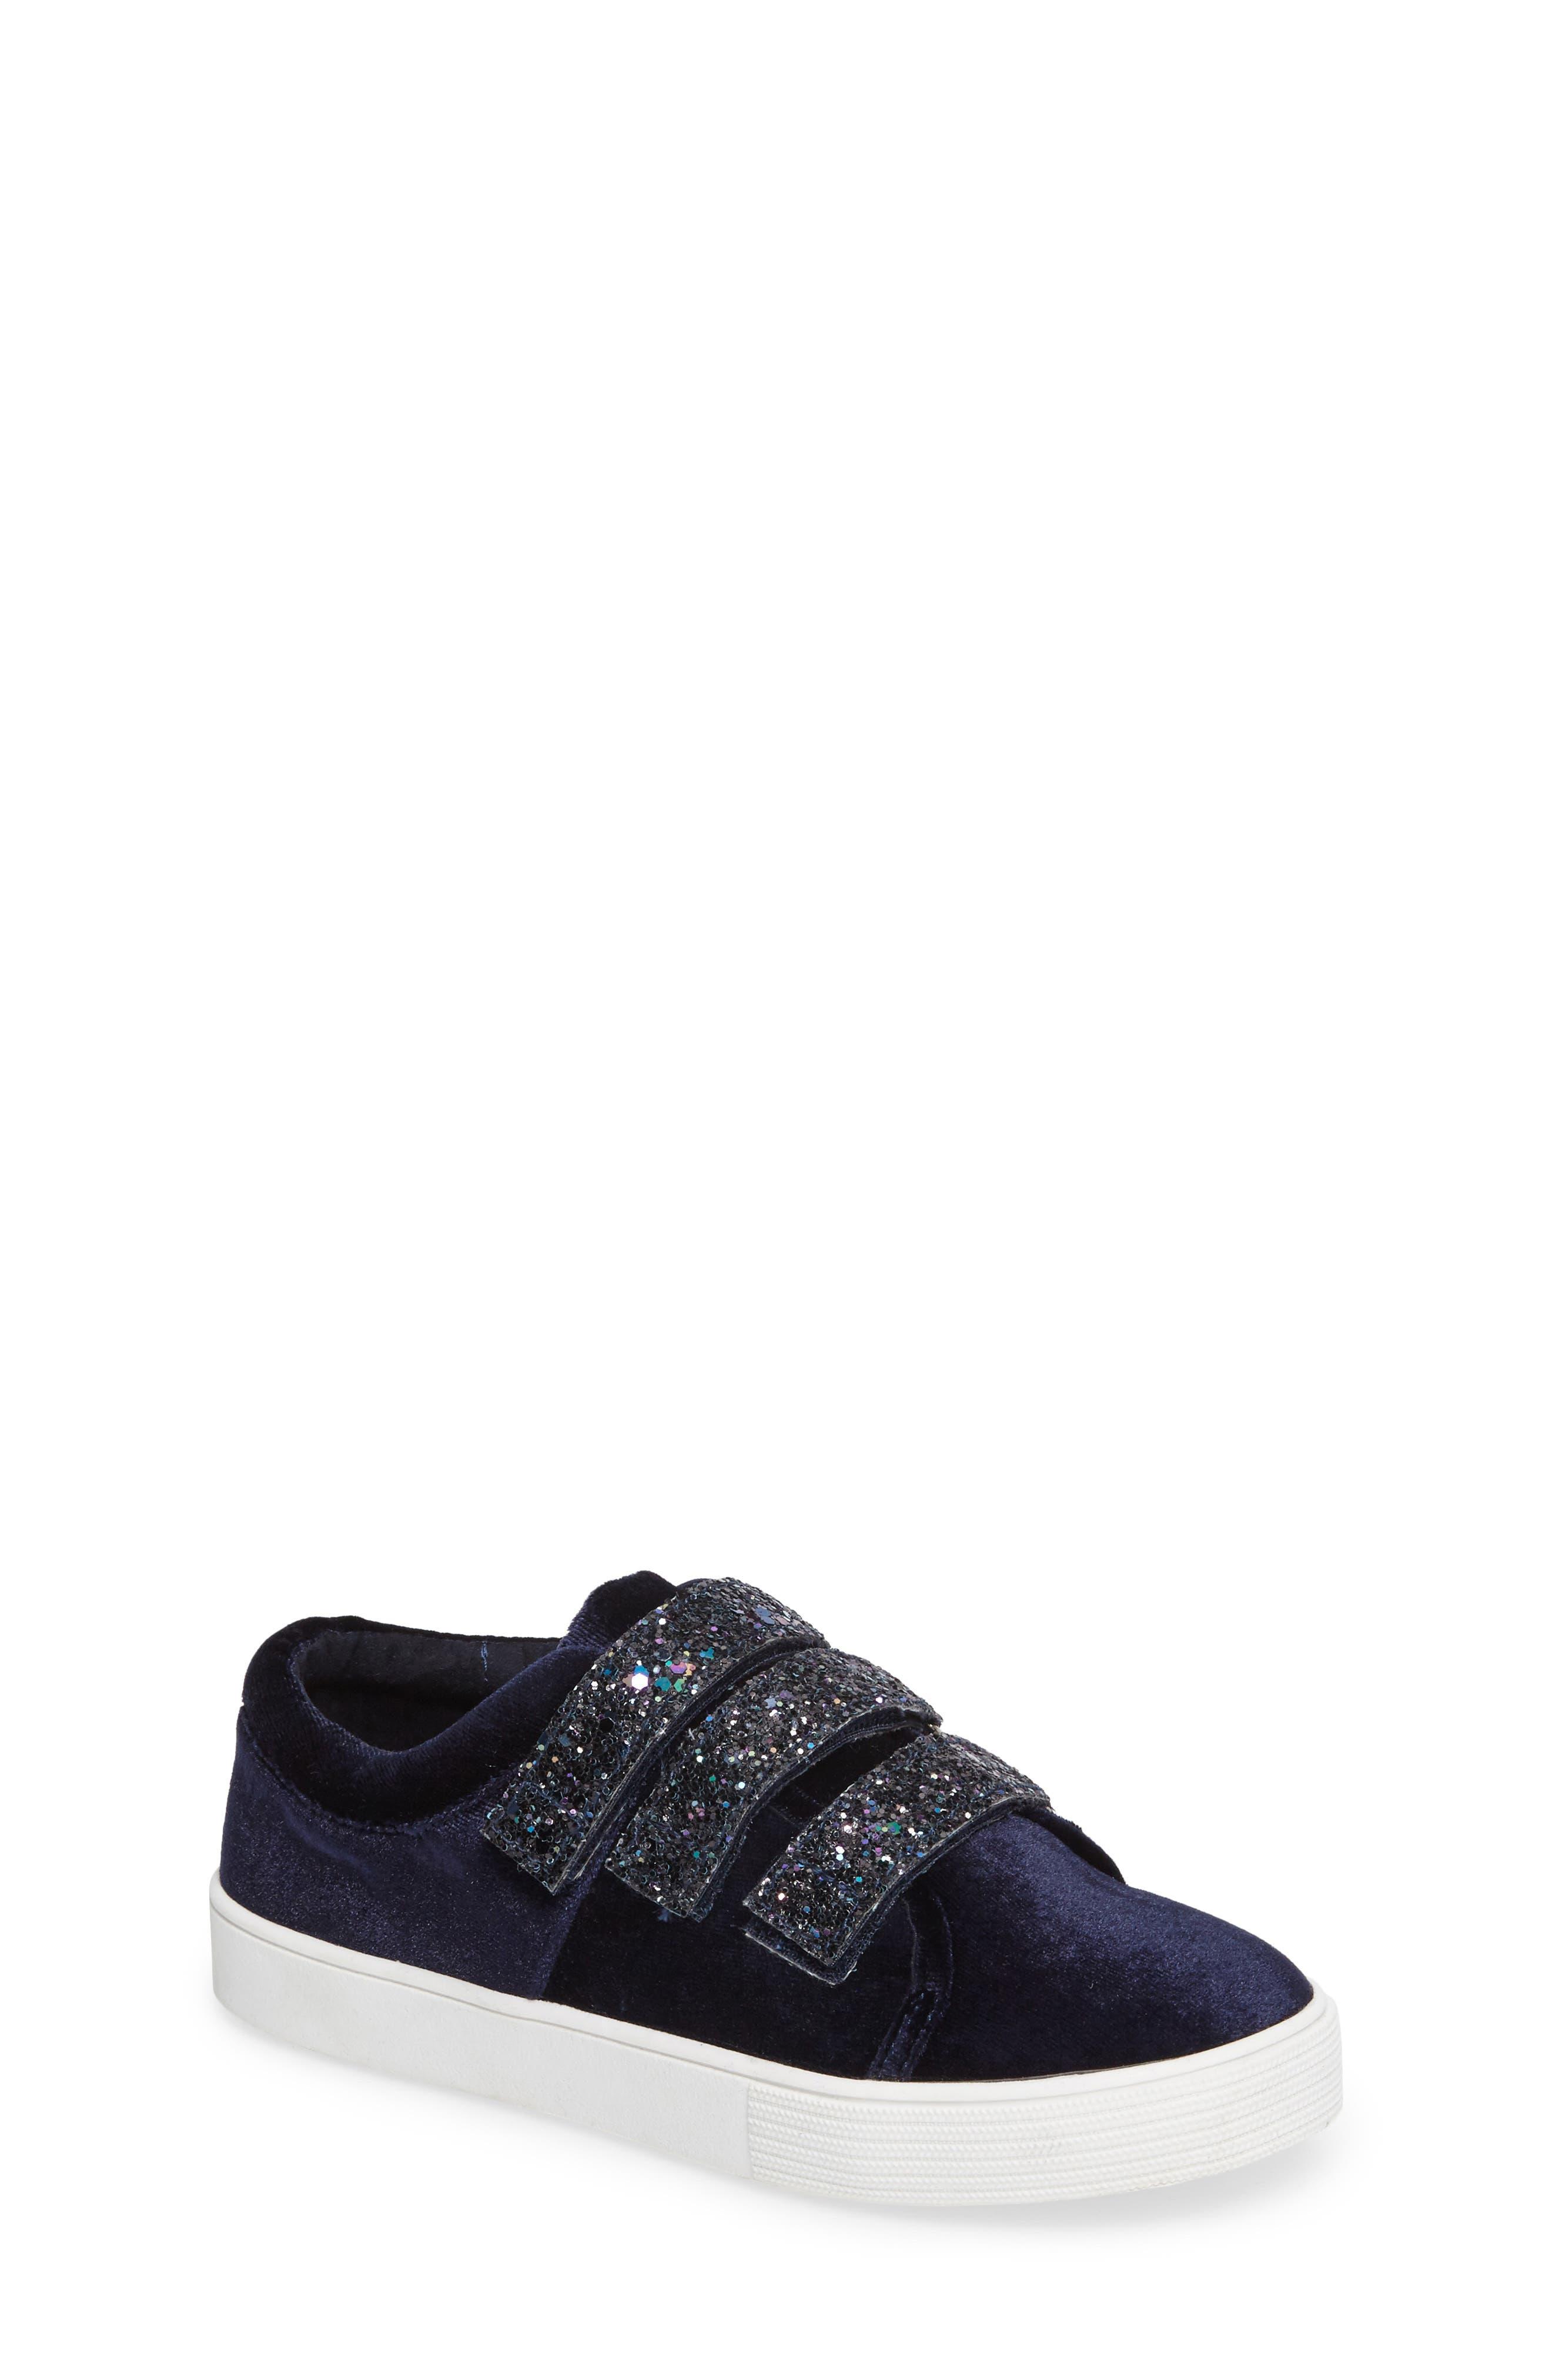 Kenneth Cole New York Kam Glitter Strap Sneaker (Toddler, Little Kid & Big Kid)